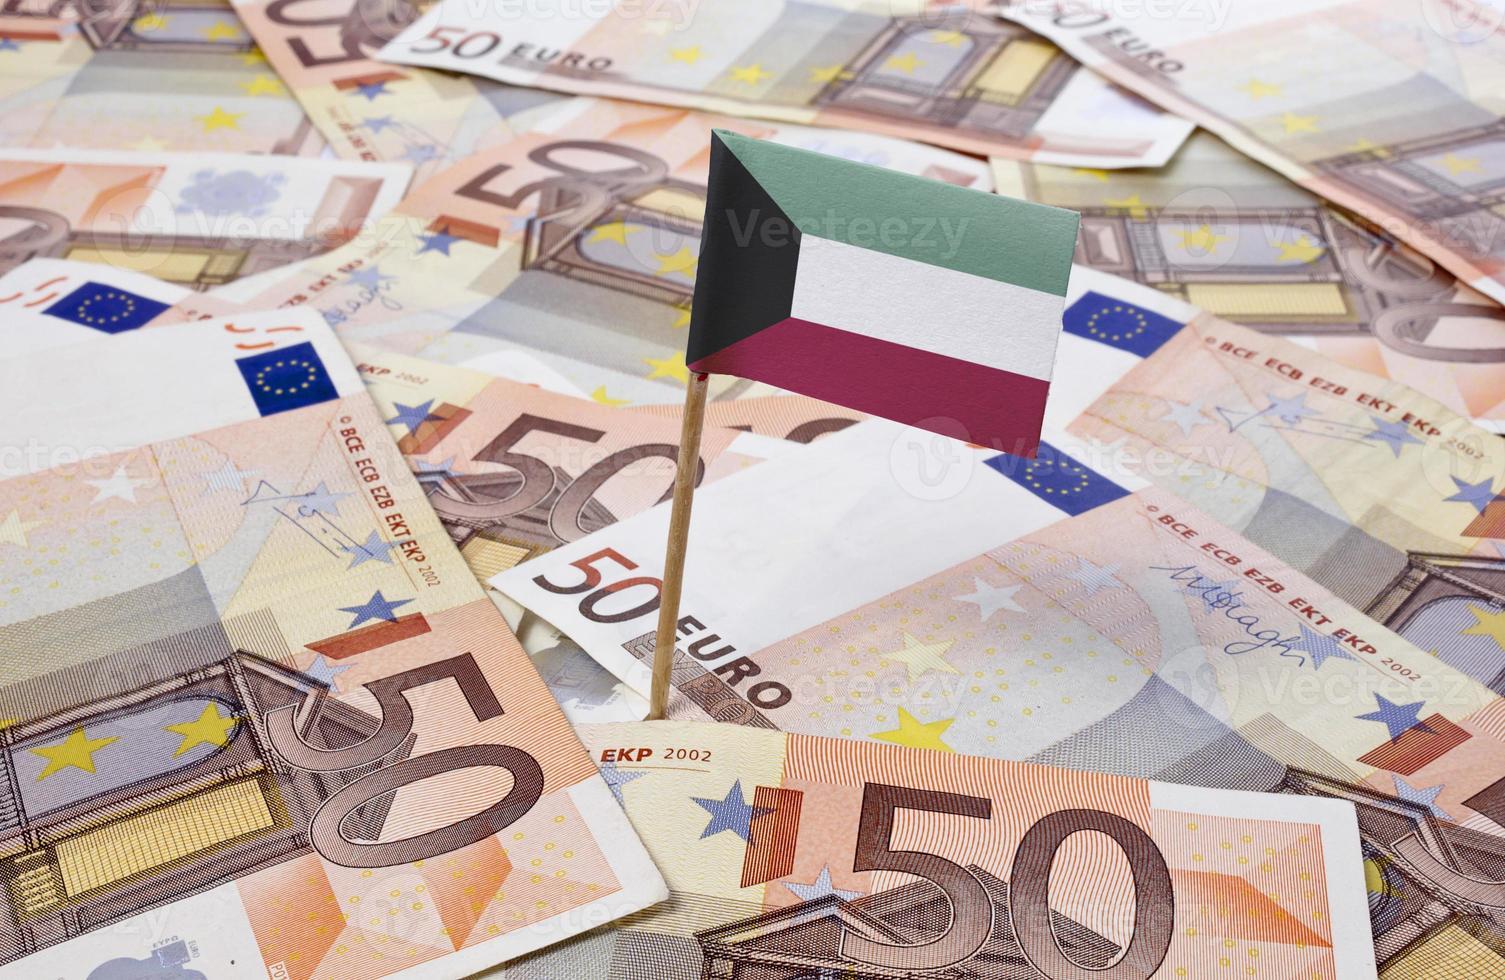 Bandeira do Kuwait, degola nas notas de 50 euros. (Série) foto